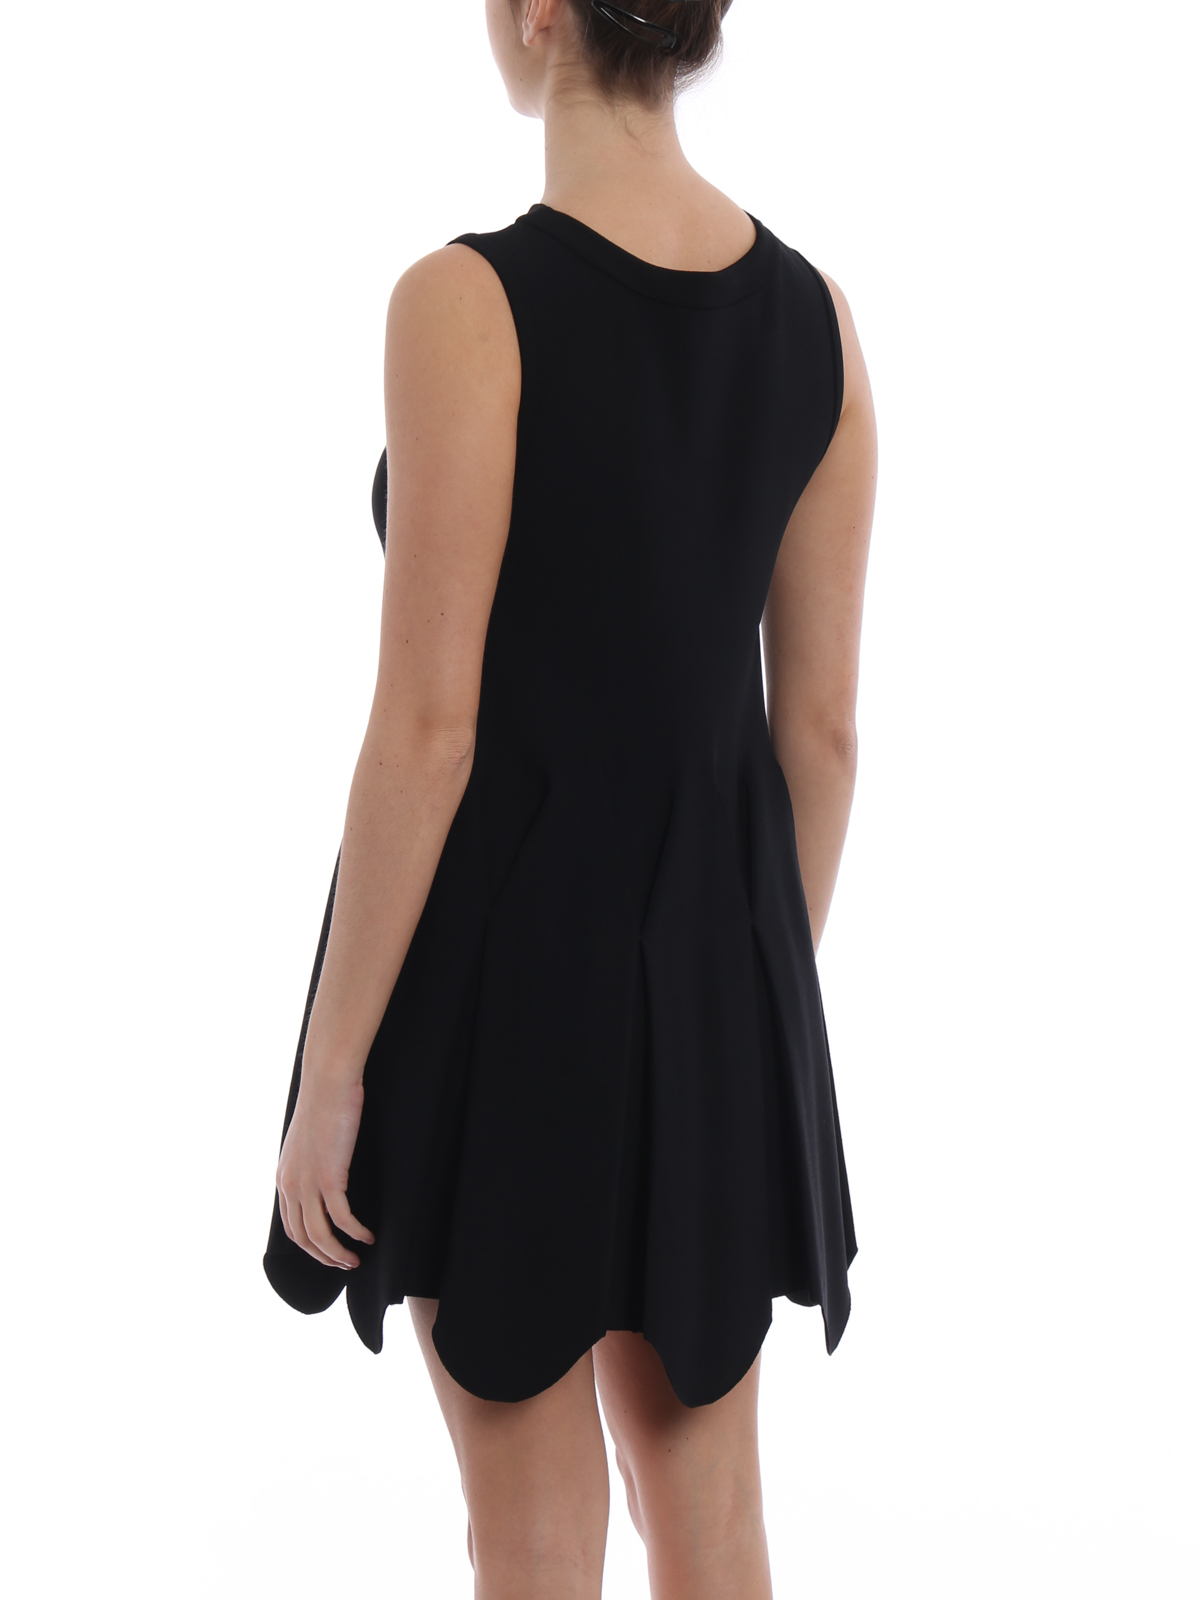 d392e09271d Alaïa - Mermaid short black jersey dress - cocktail dresses ...